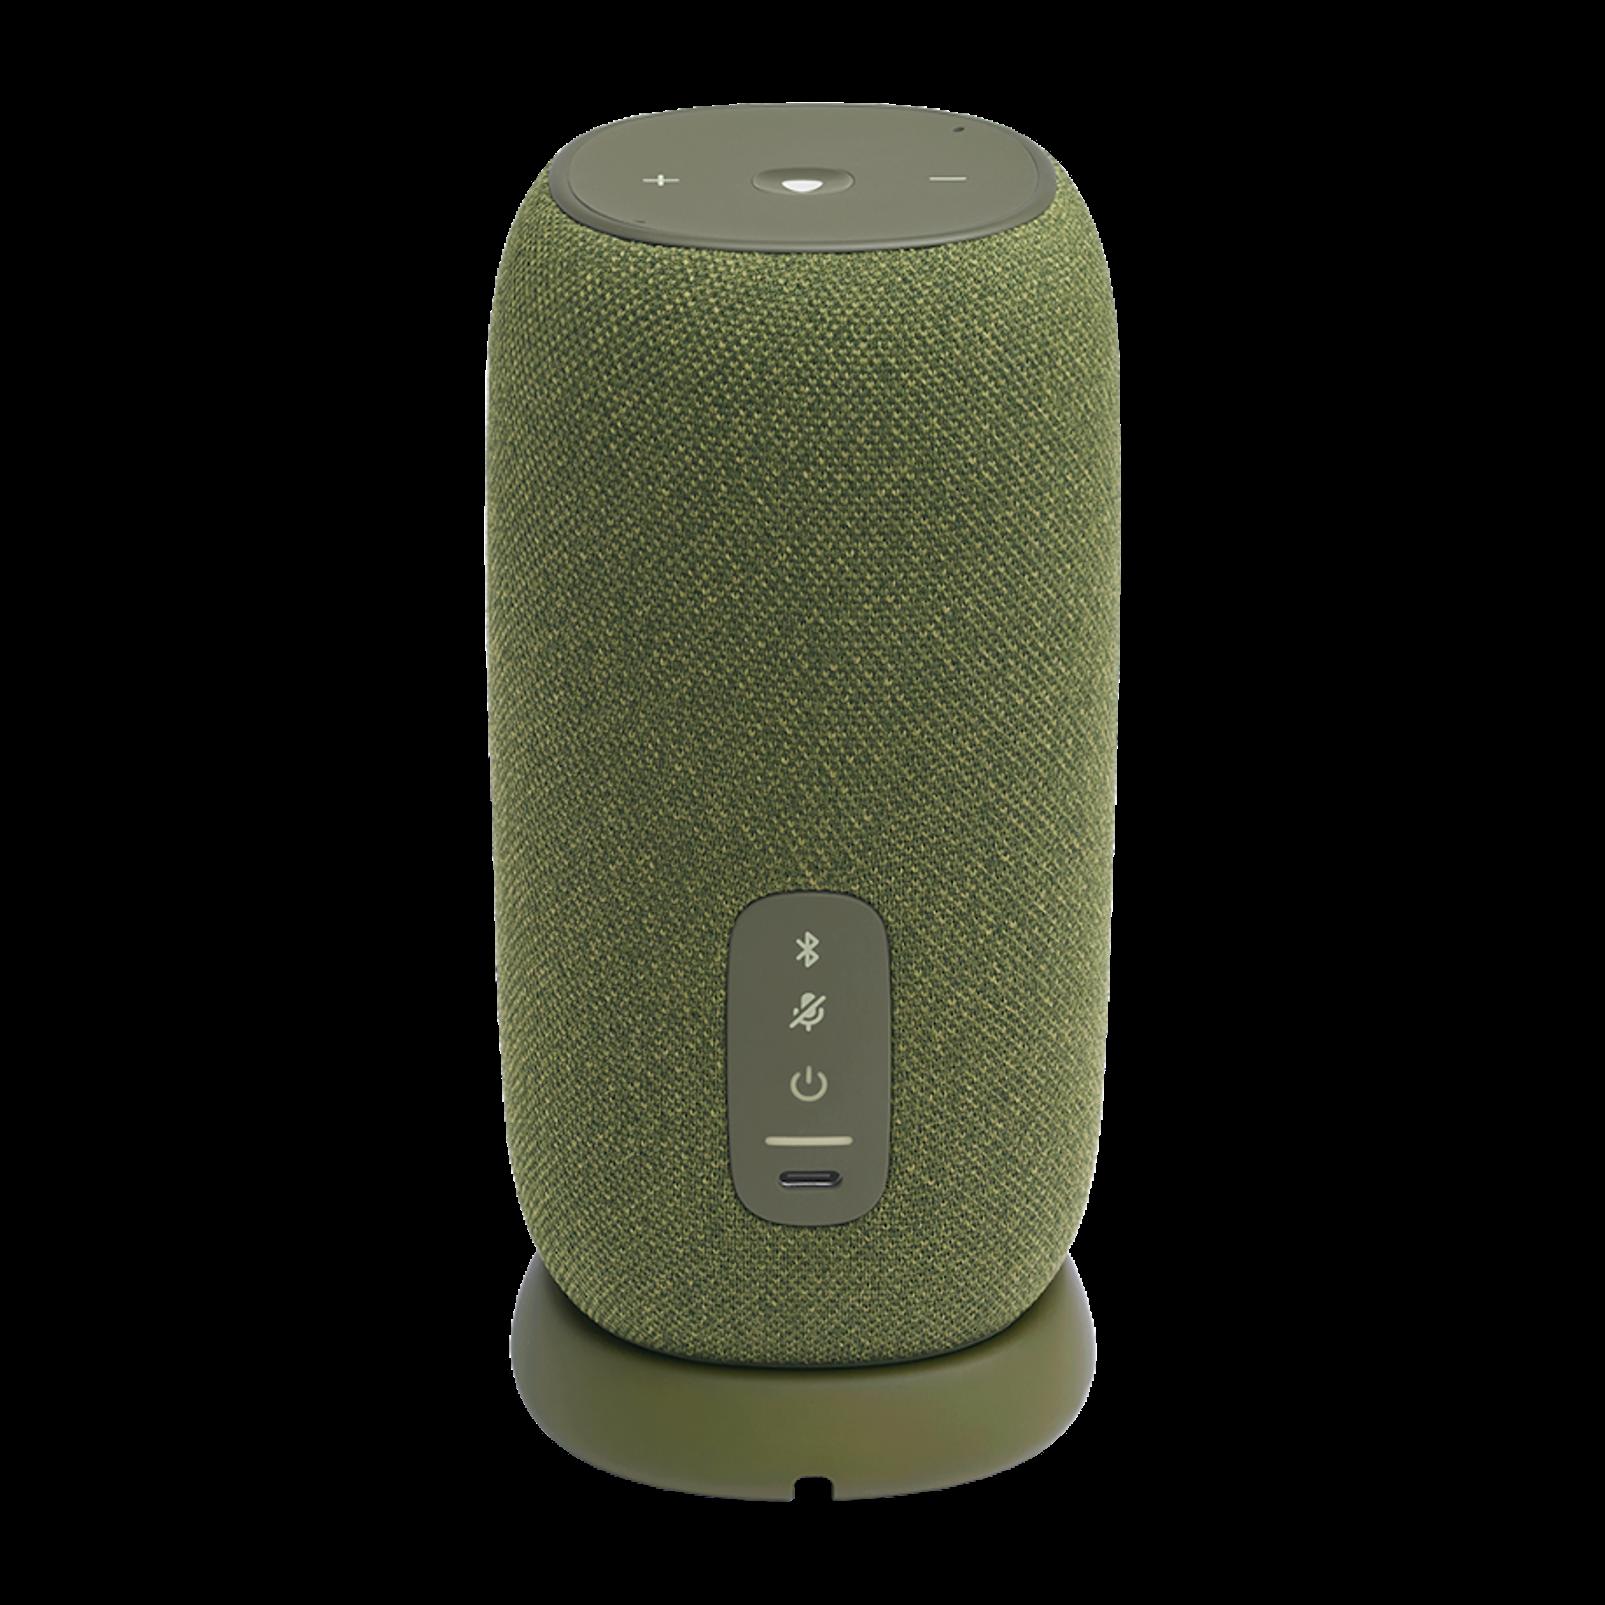 Link Portable Yandex - Green - Back